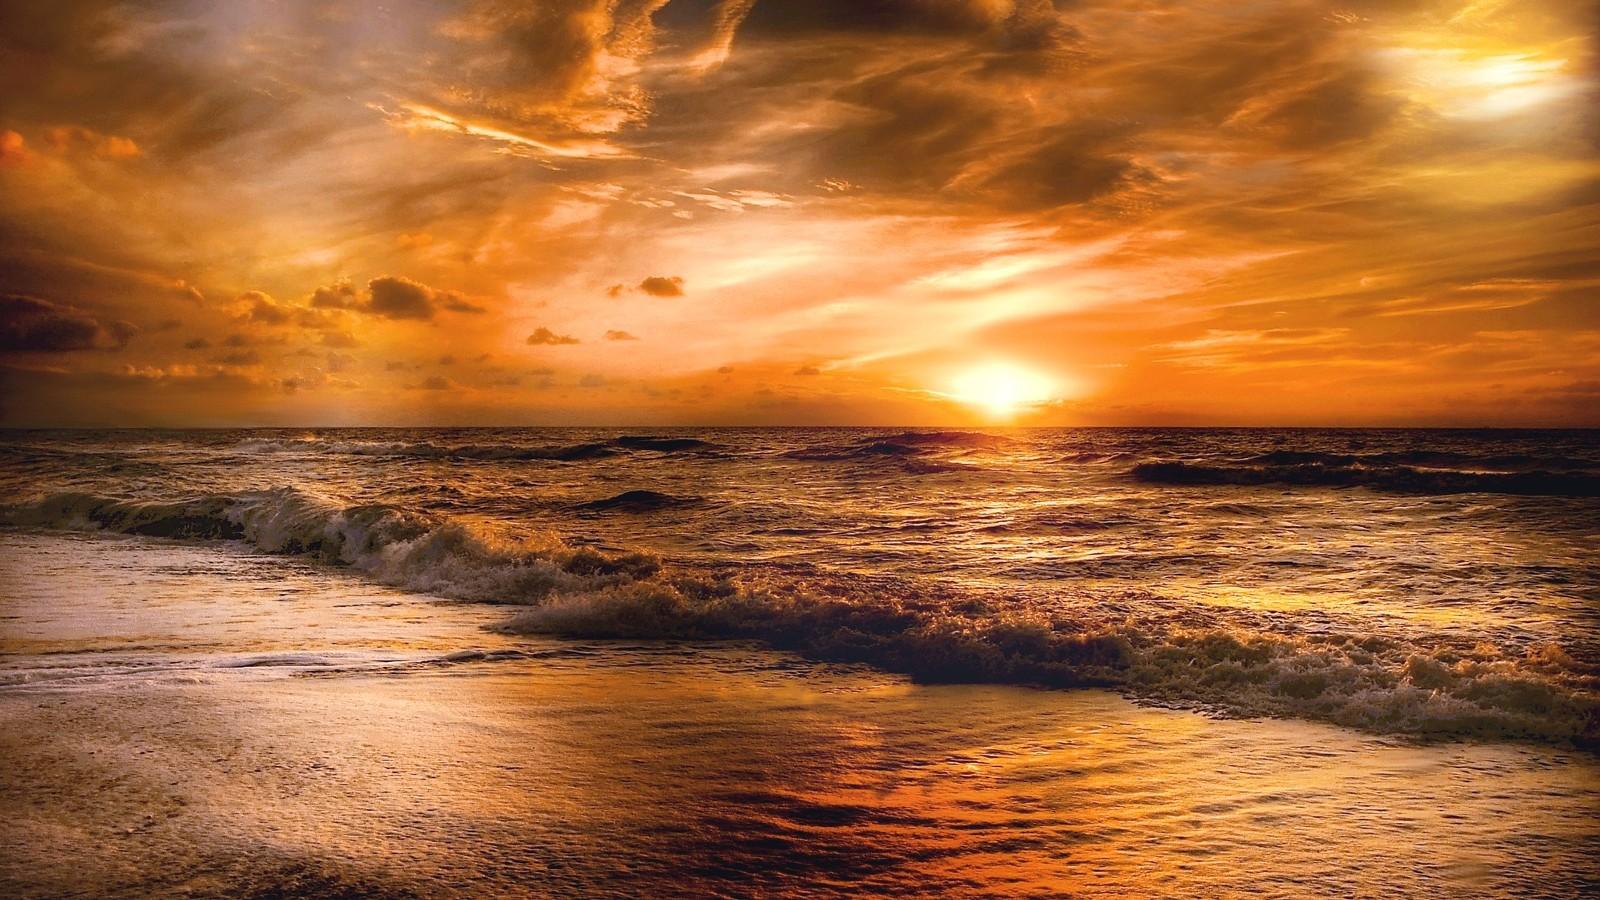 sunset short story header image